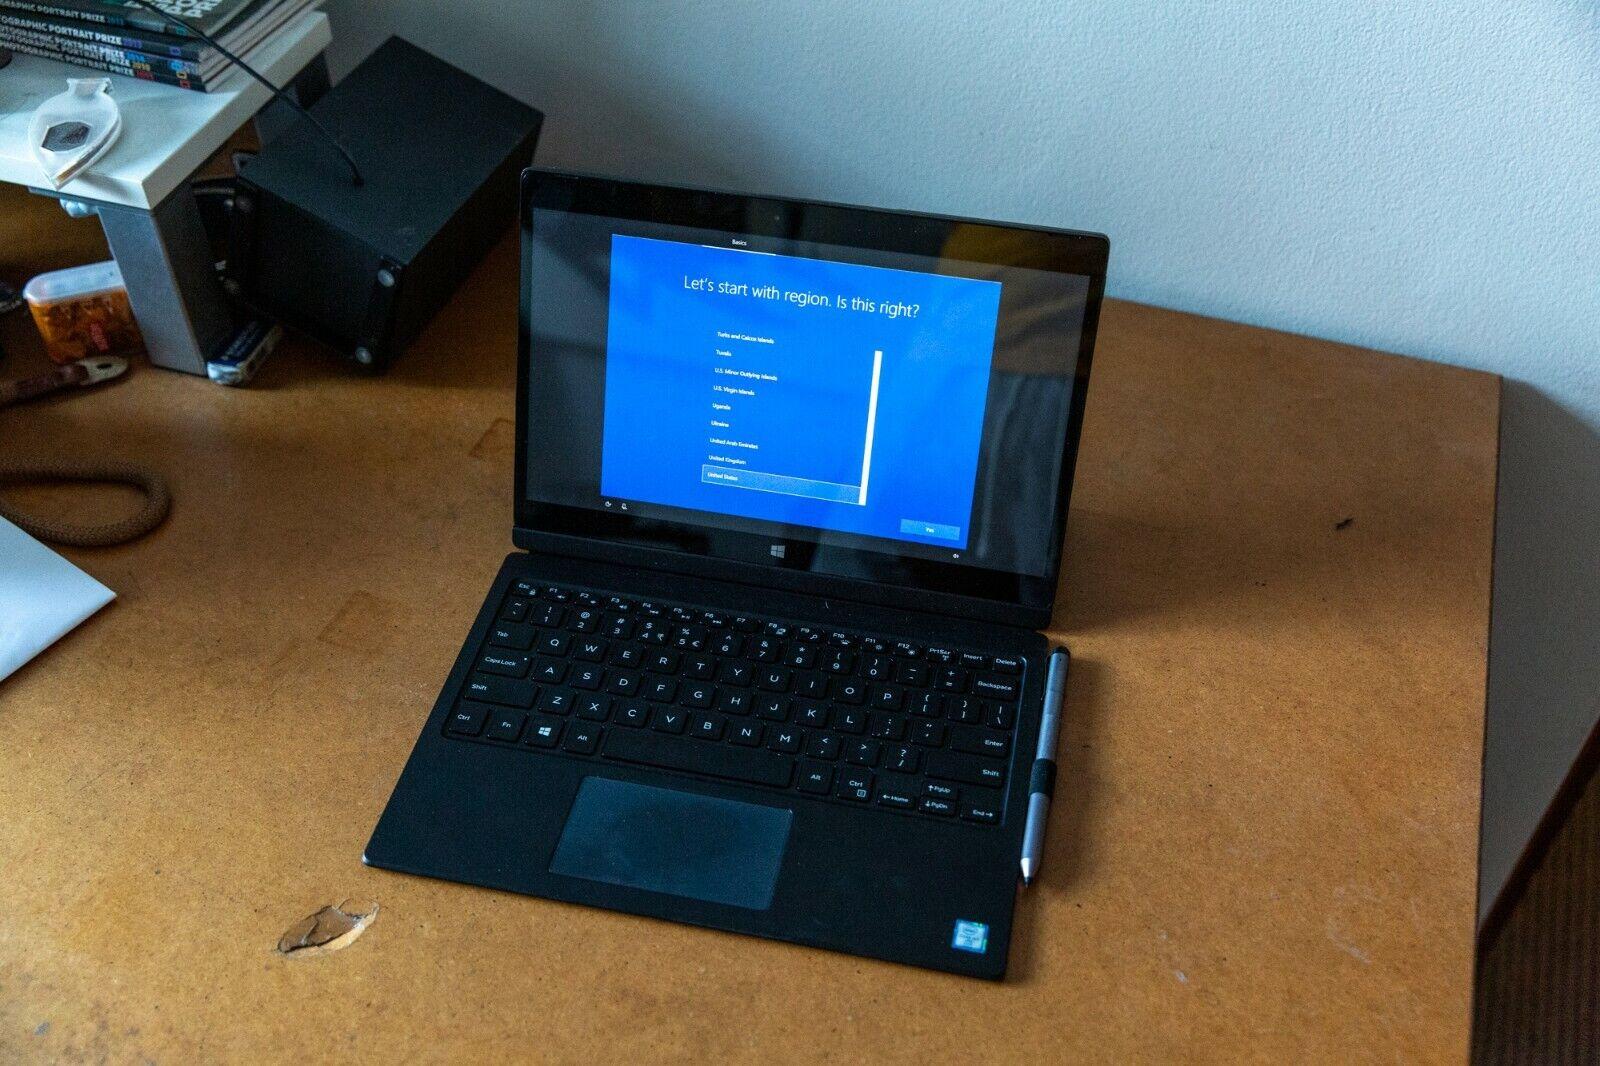 Laptop Windows - Dell Latitude 7275 12.5 inch Windows 10 Netbook Tablet Laptop